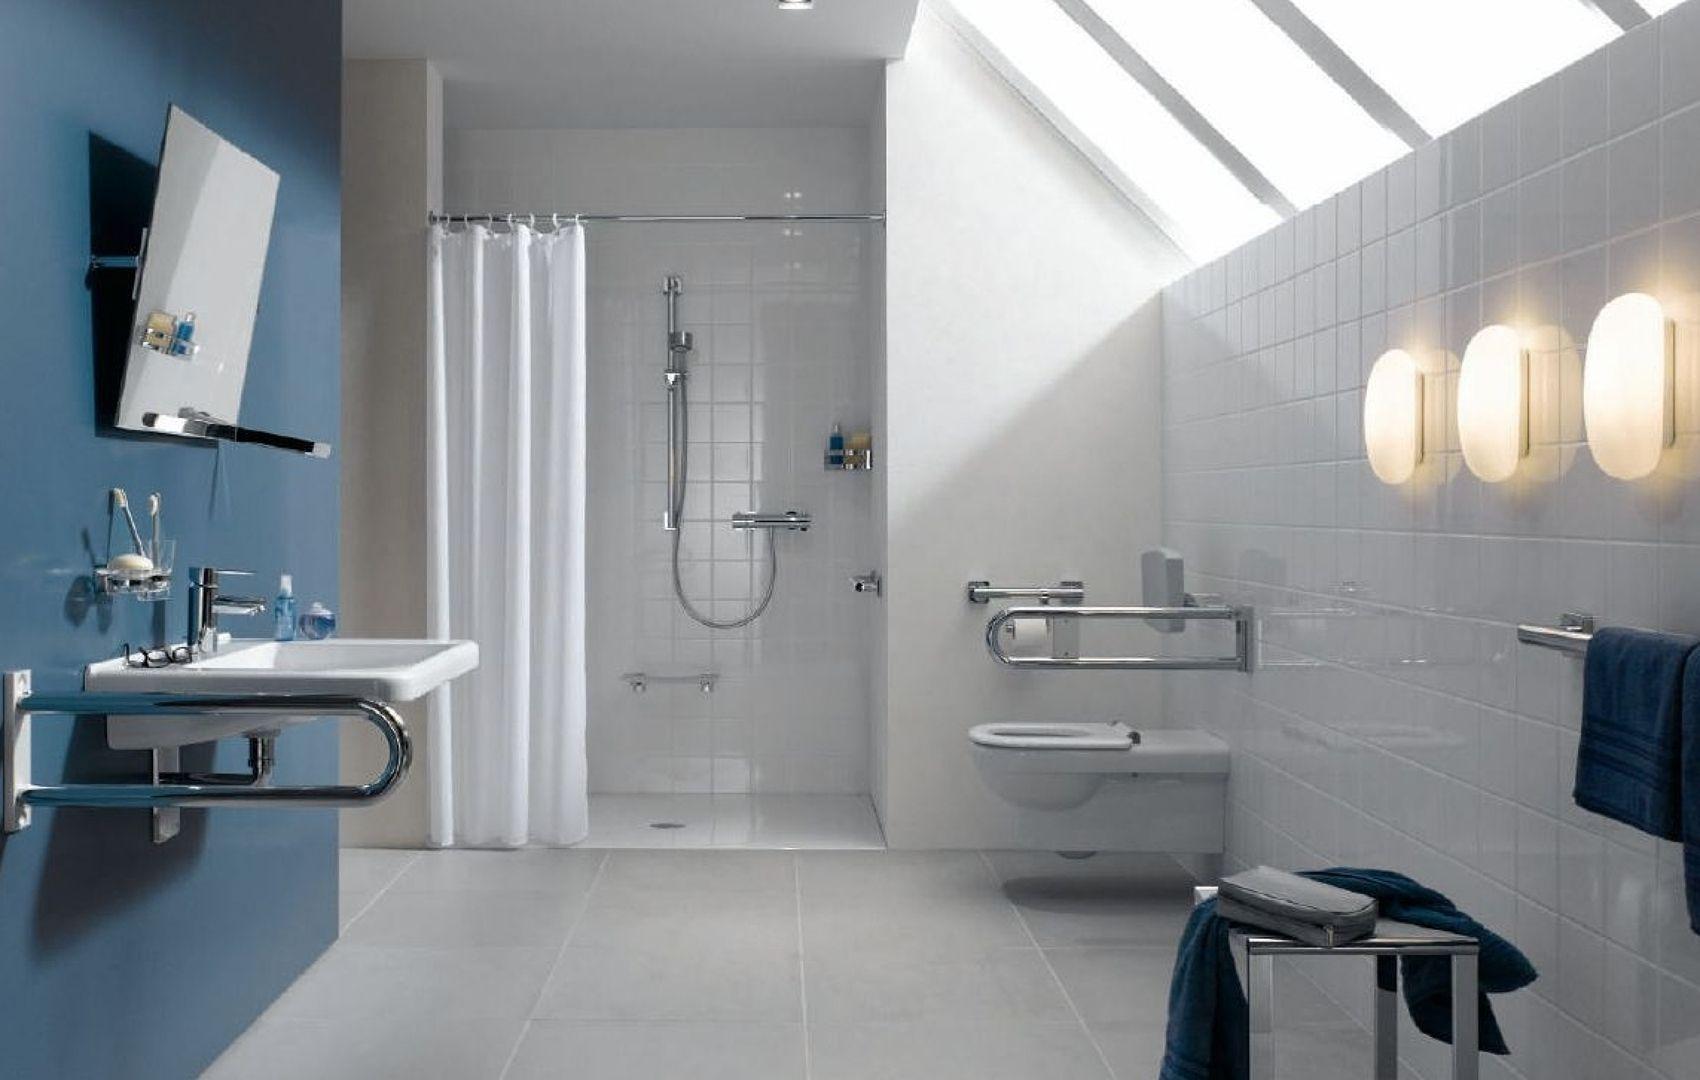 Cortina ducha   Cortinas de ducha, Casas, Duchas